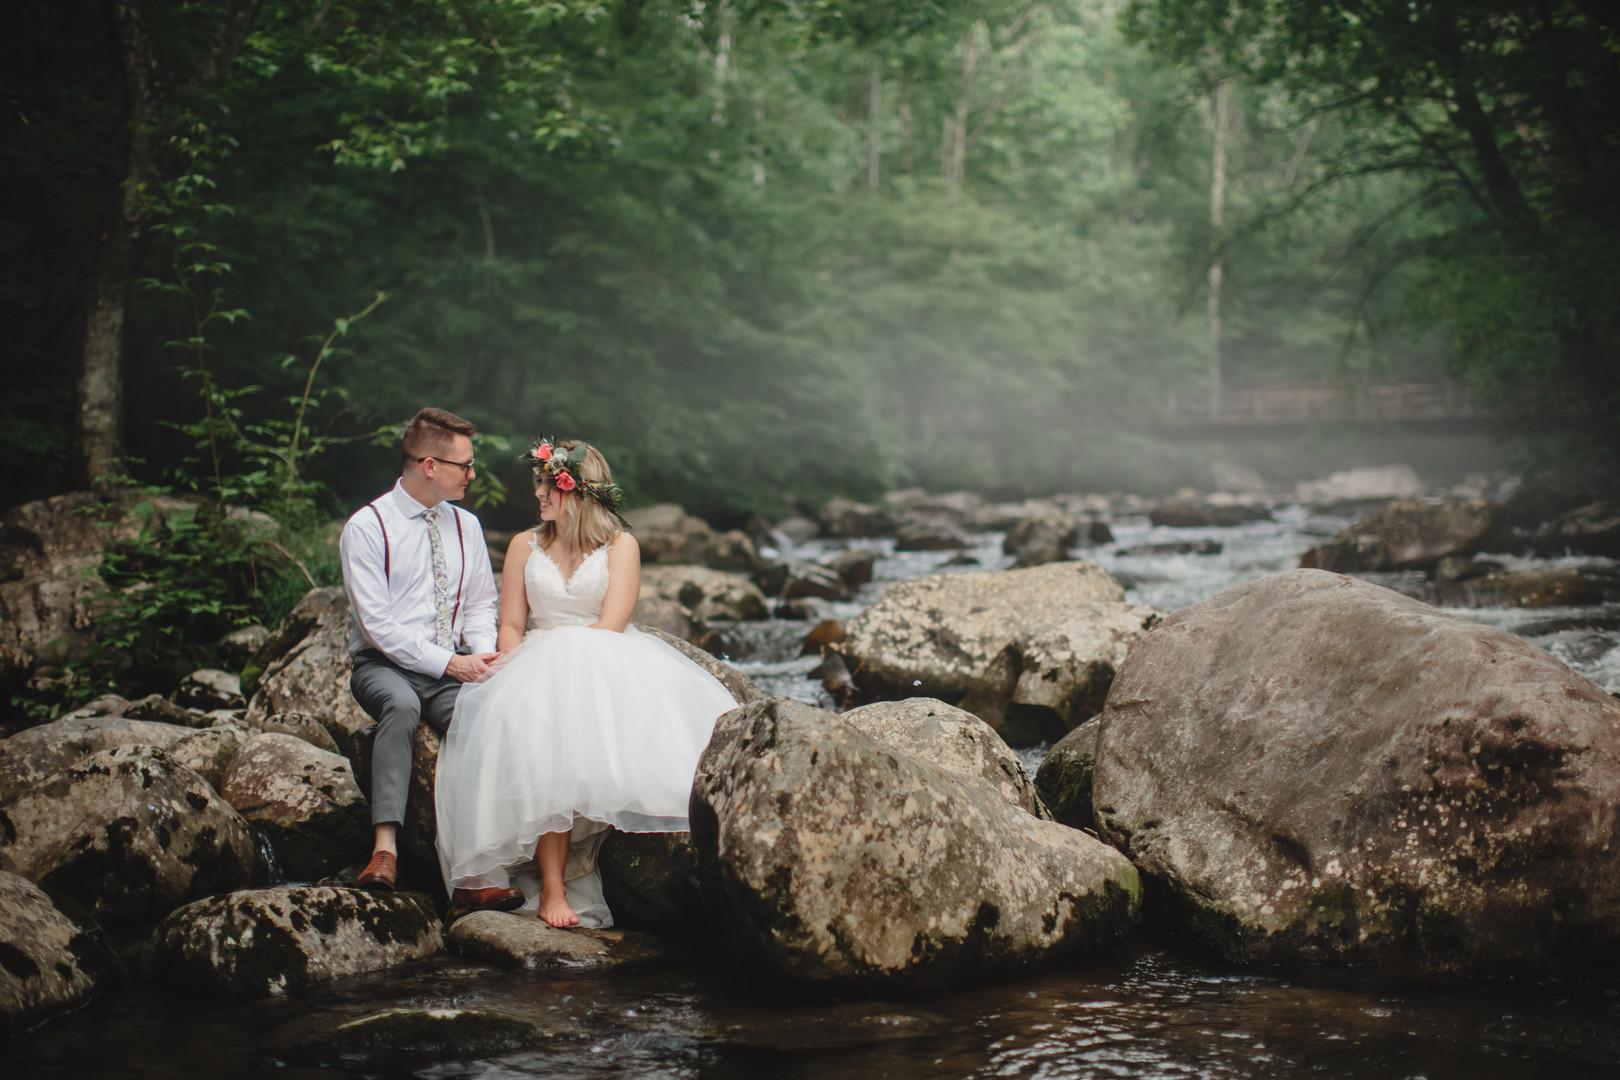 bröllop+blogg+inspiration